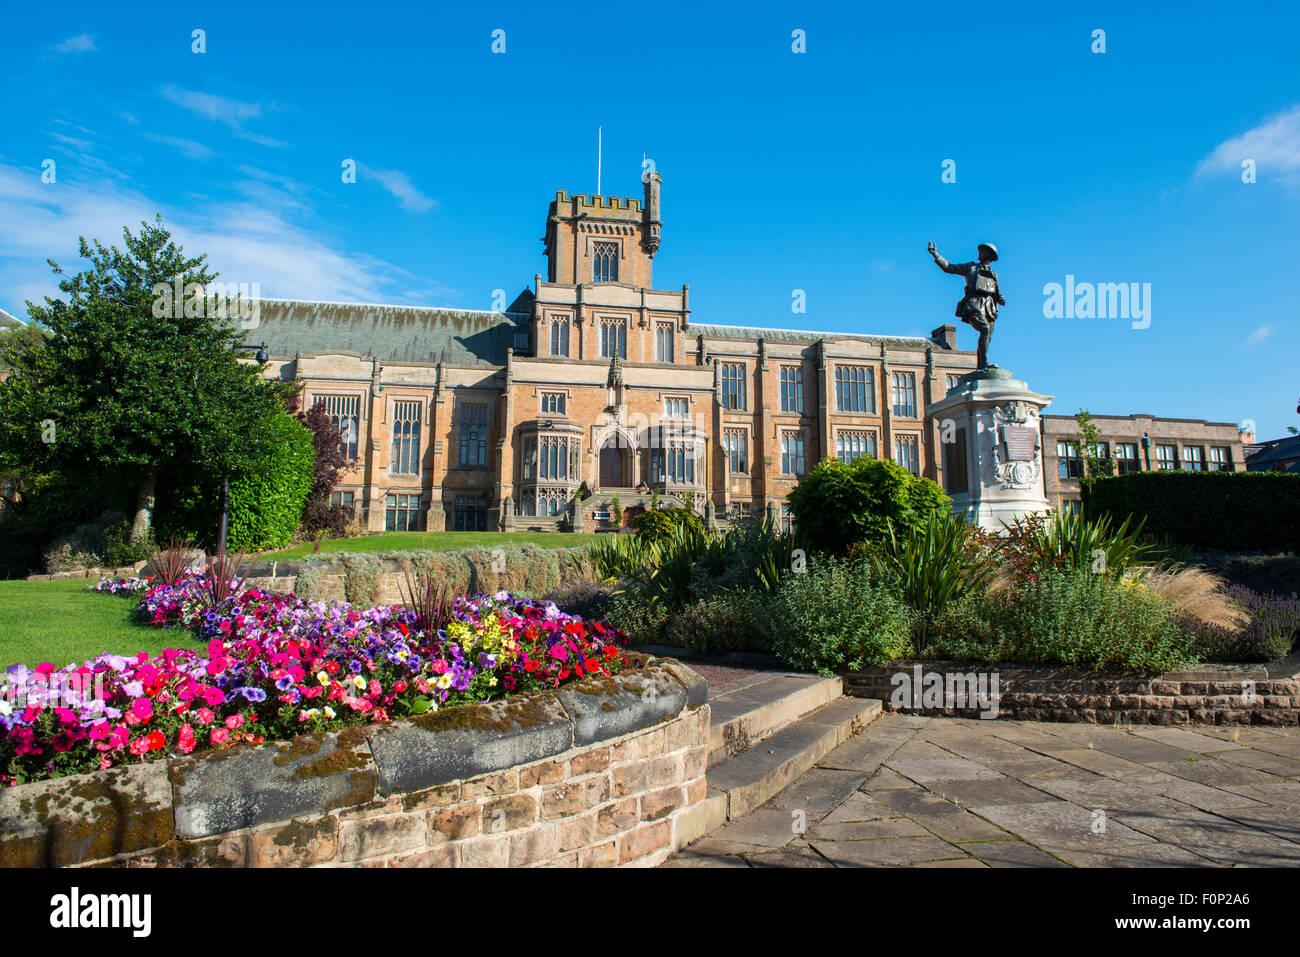 Nottingham high School, Nottinghamshire England UK - Stock Image